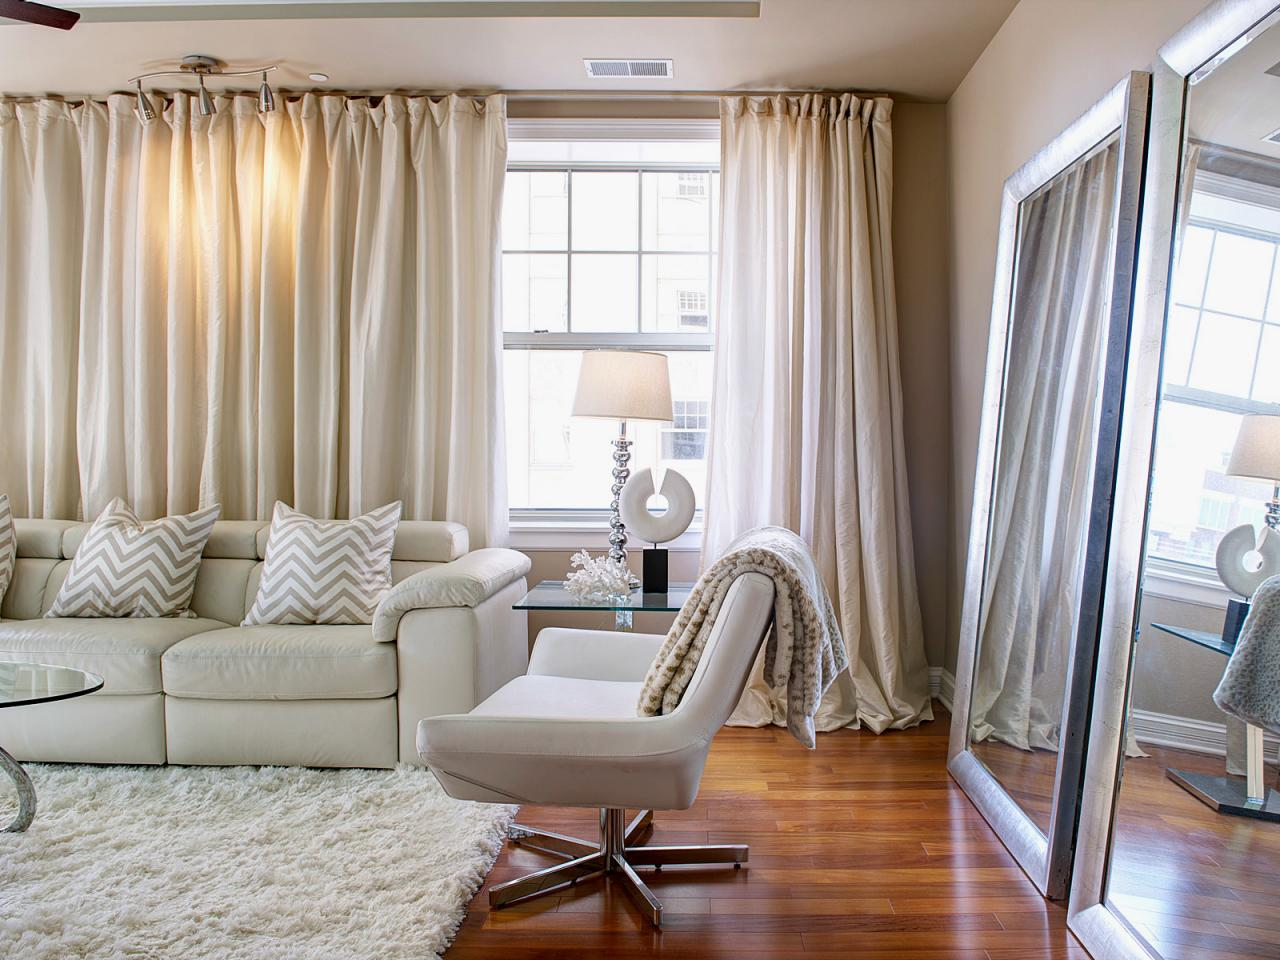 Beautiful Curtain Designs Living Colors Valance Room Windows Freshsdg